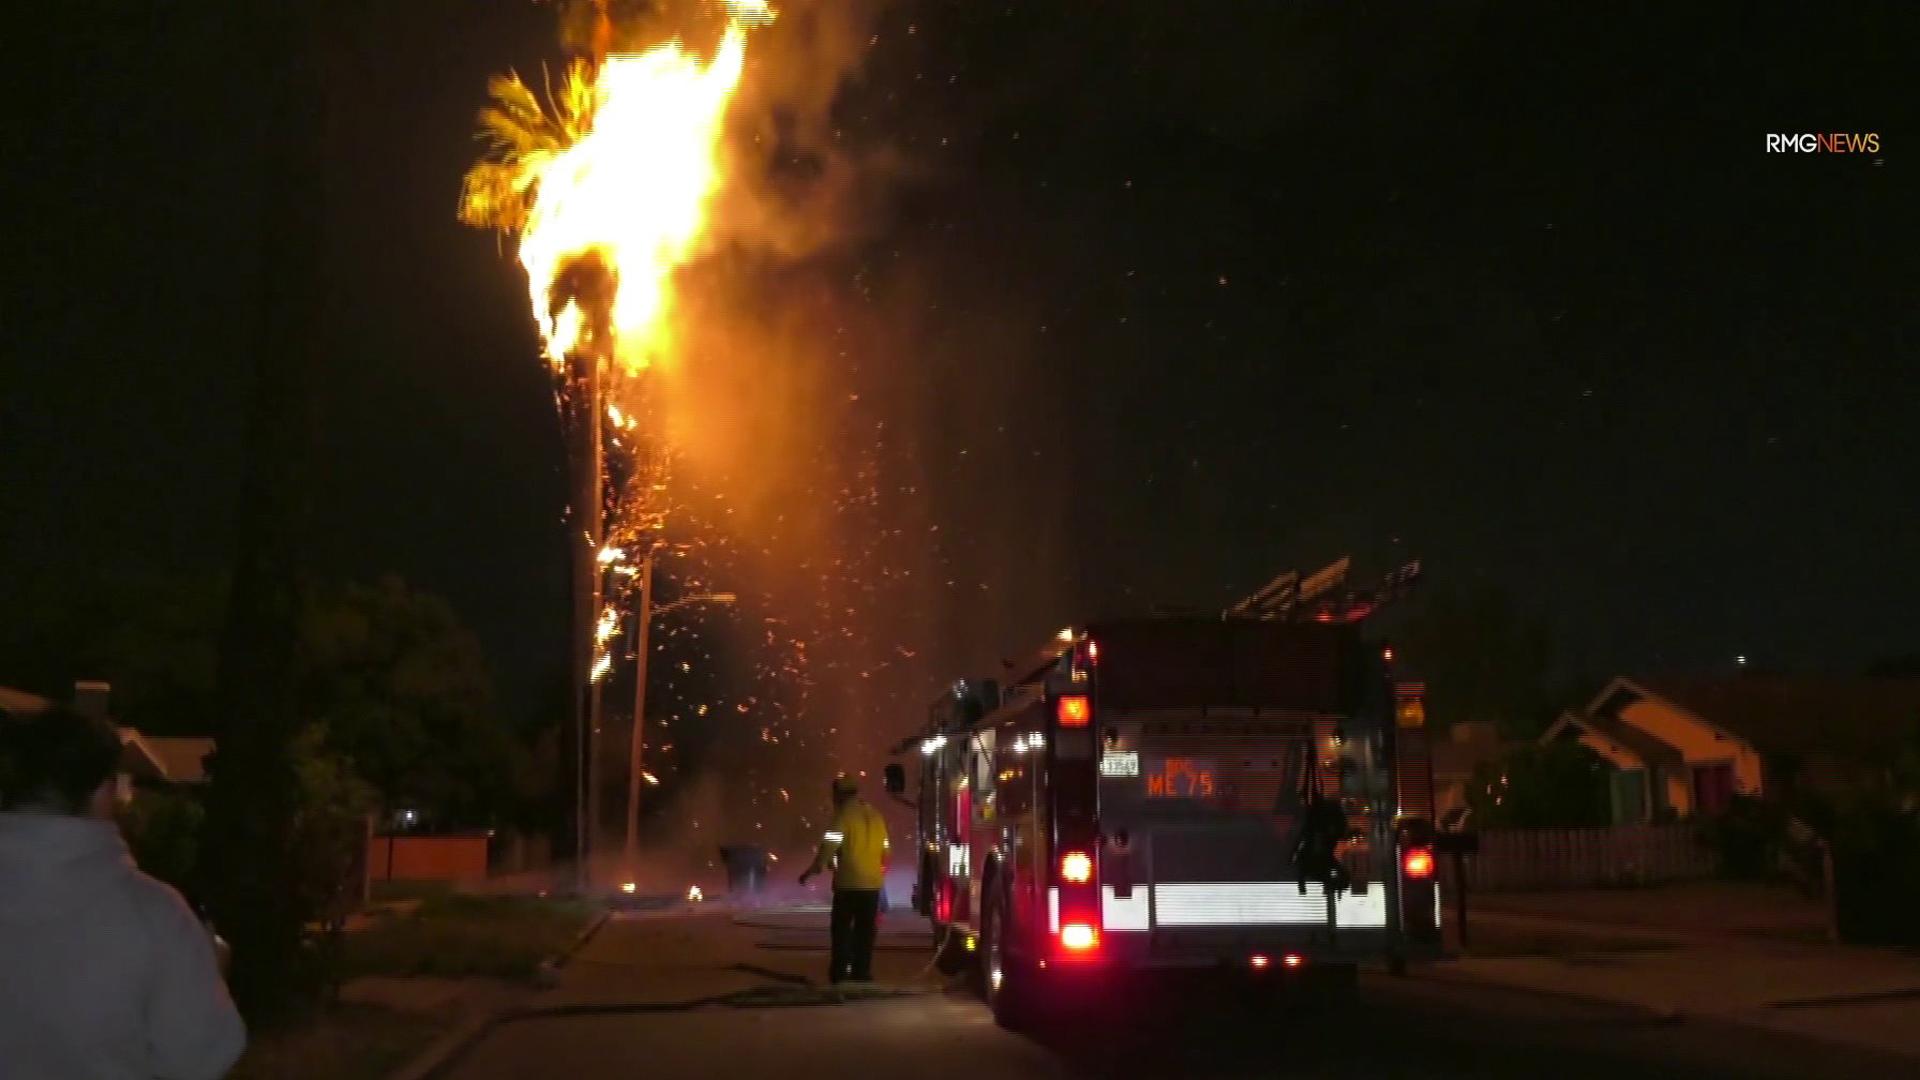 Fireworks ignited a palm tree fire in San Bernardino on July 4, 2019. (Credit: RMG News)